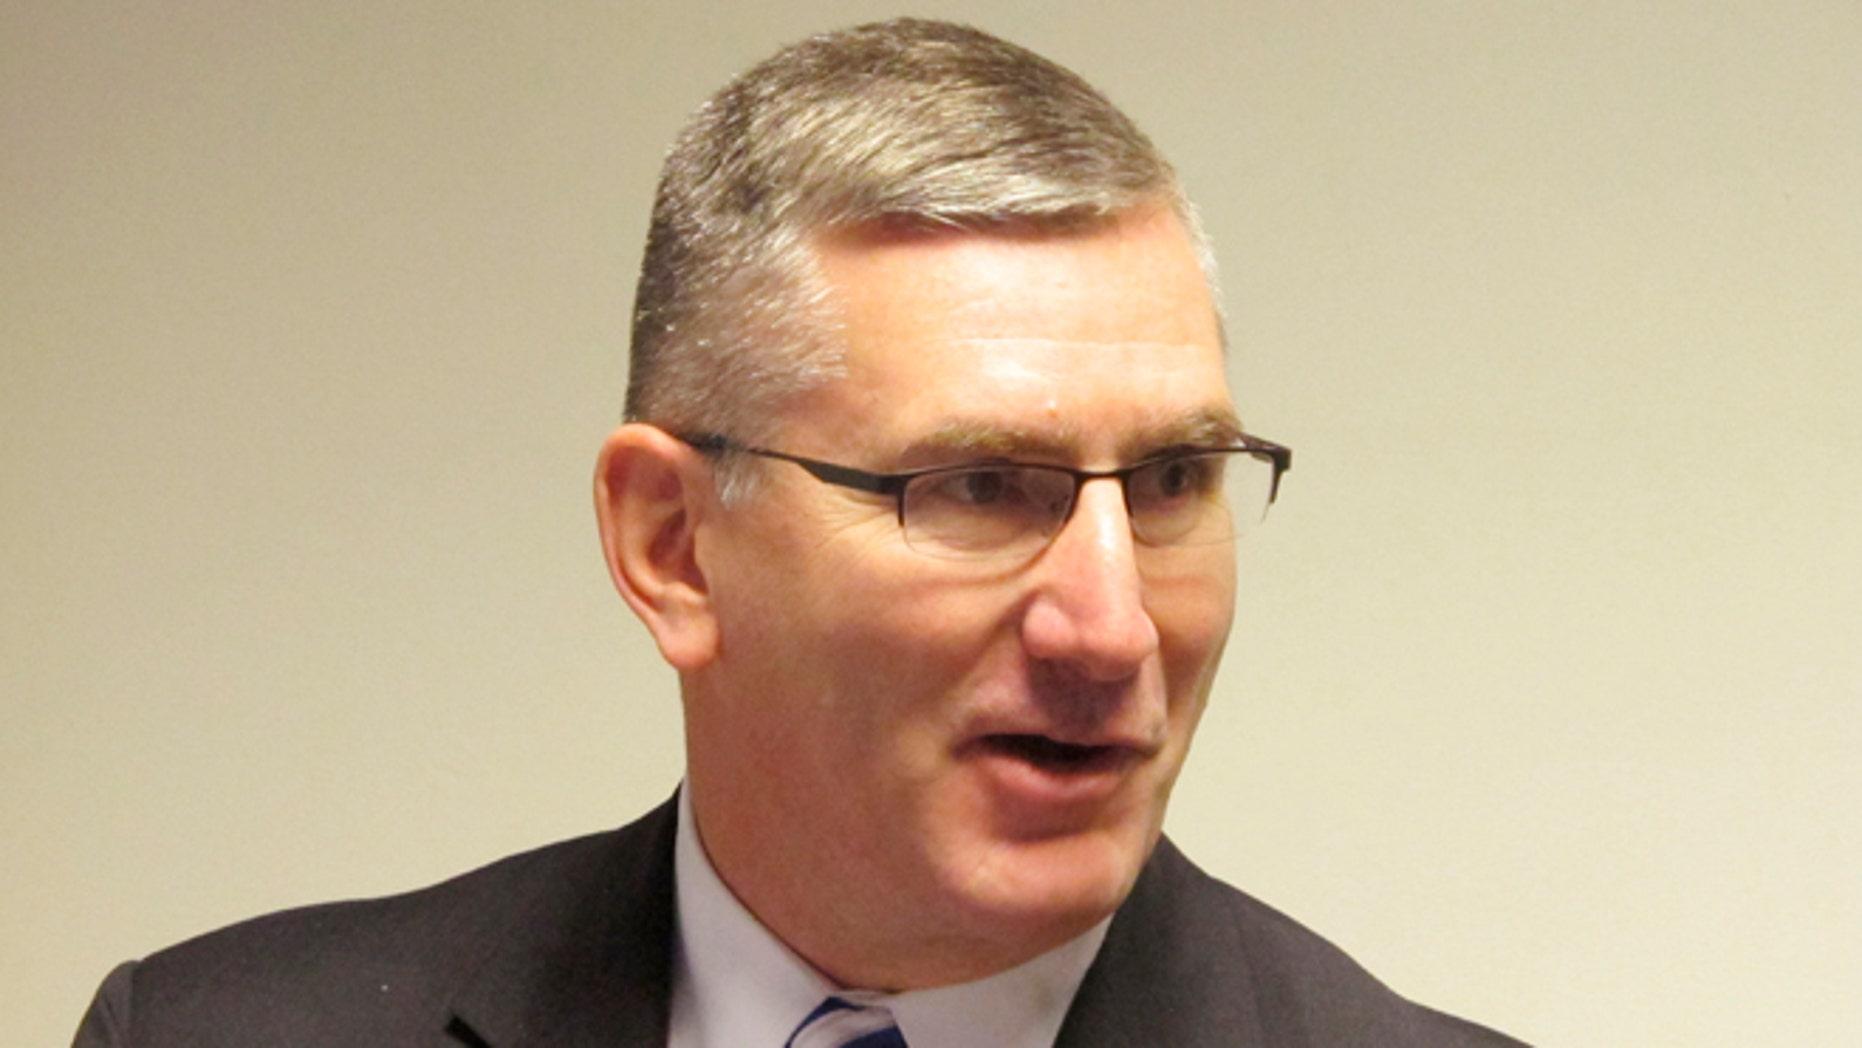 In this Jan. 26, 2014 file photo U.S. Sen. John Walsh speaks to reporters in Helena, Mont.